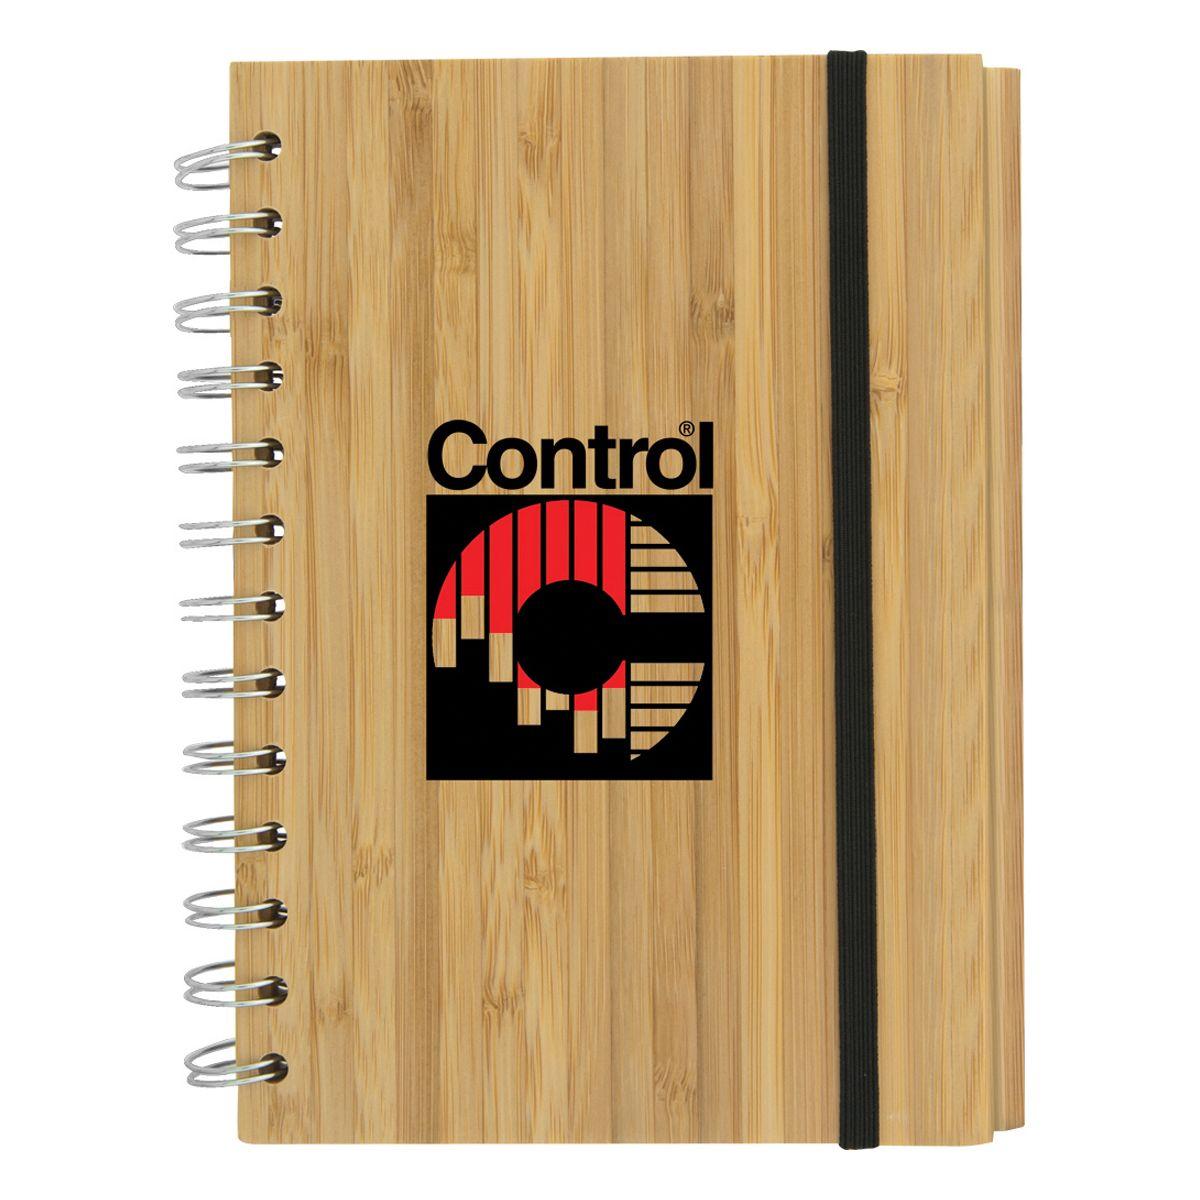 Bamboo Eco Notebook